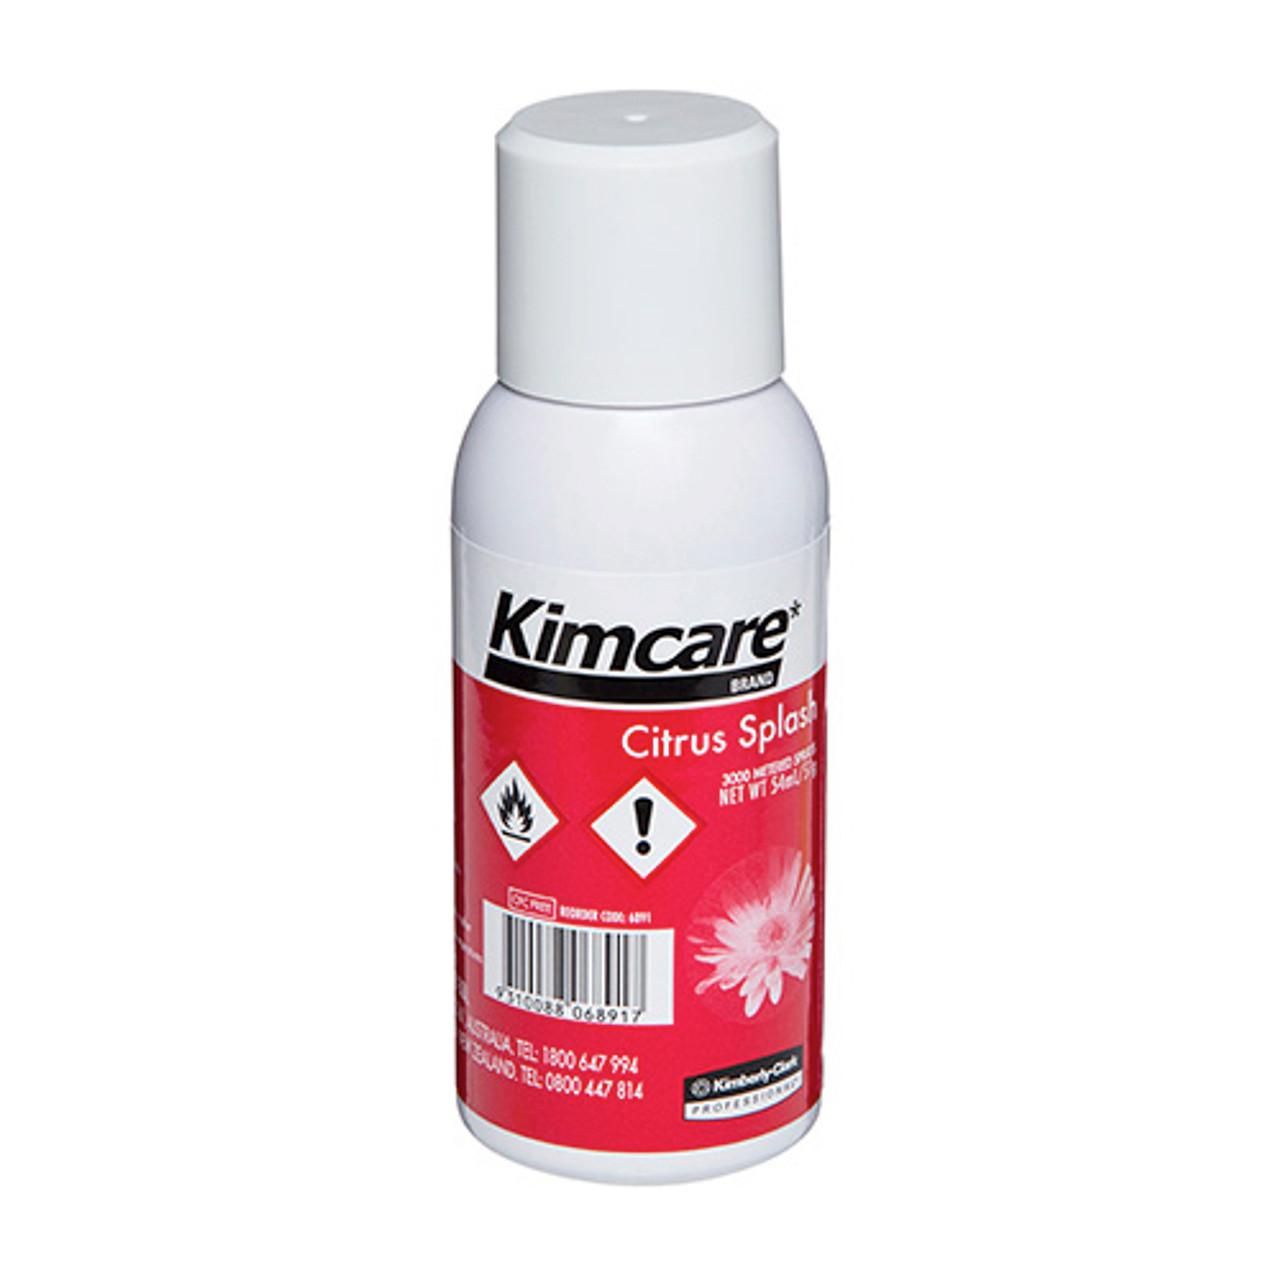 Kimcare Micromist Citrus Splash Fragrance Refill 54ml (6891) Kimberly Clark Professional